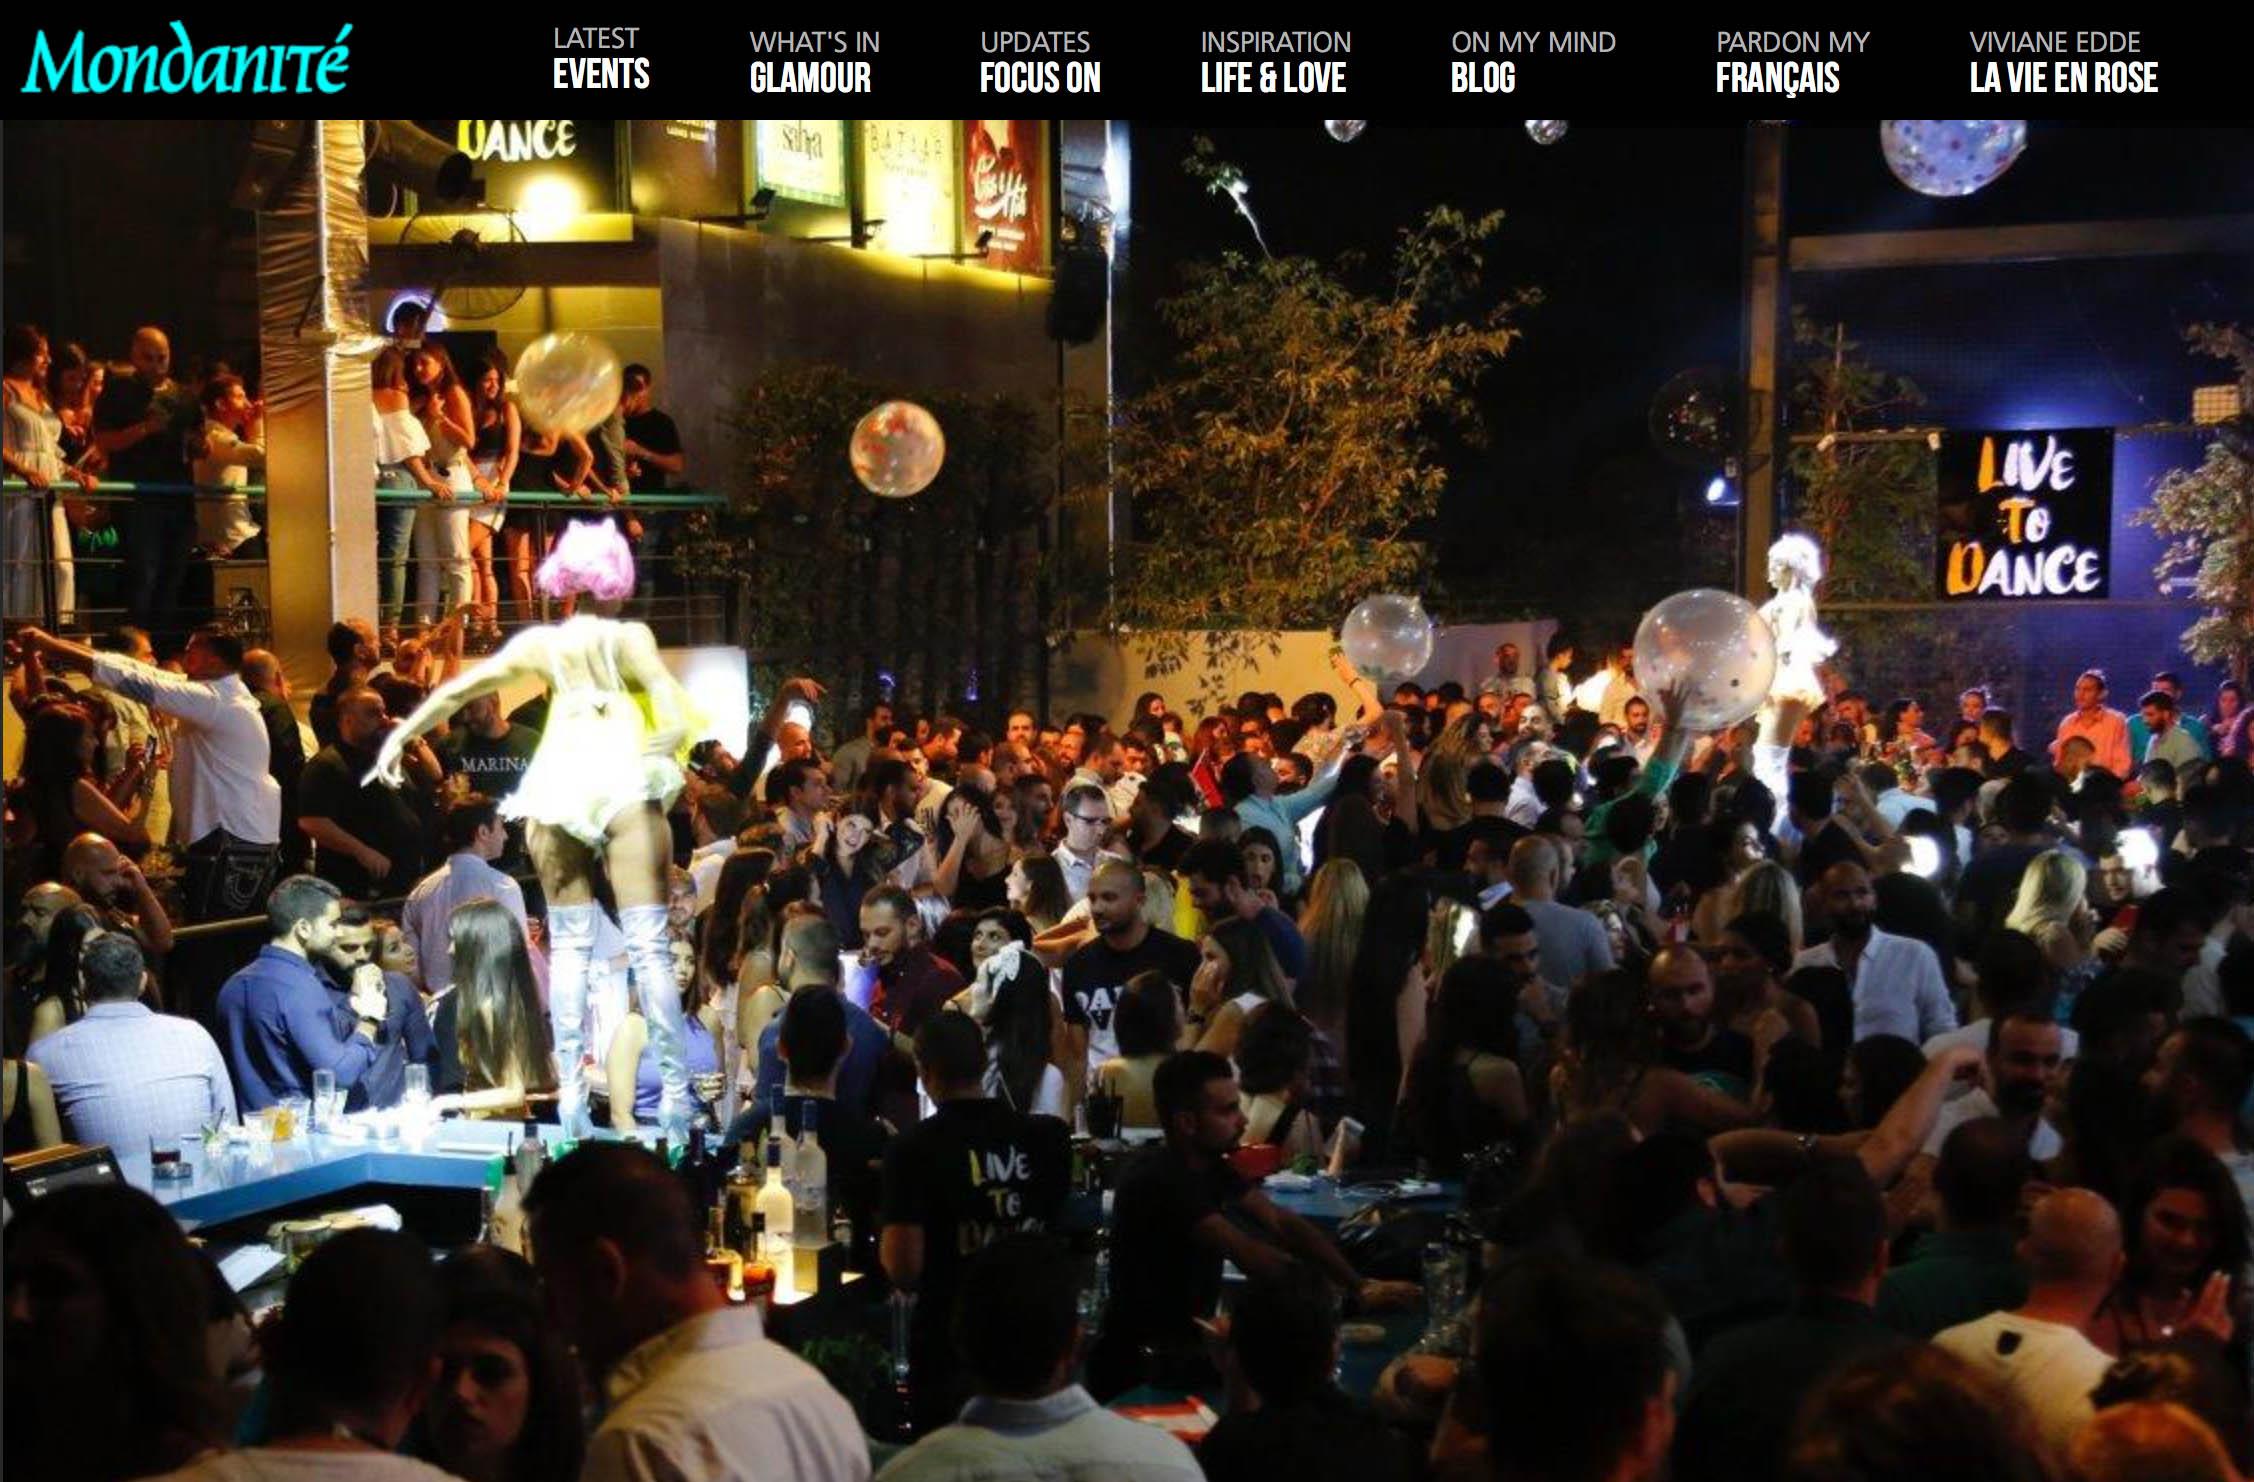 Знакомства с иностранцами бесплатно ливанцы бесплатное знакомства для женщин конада